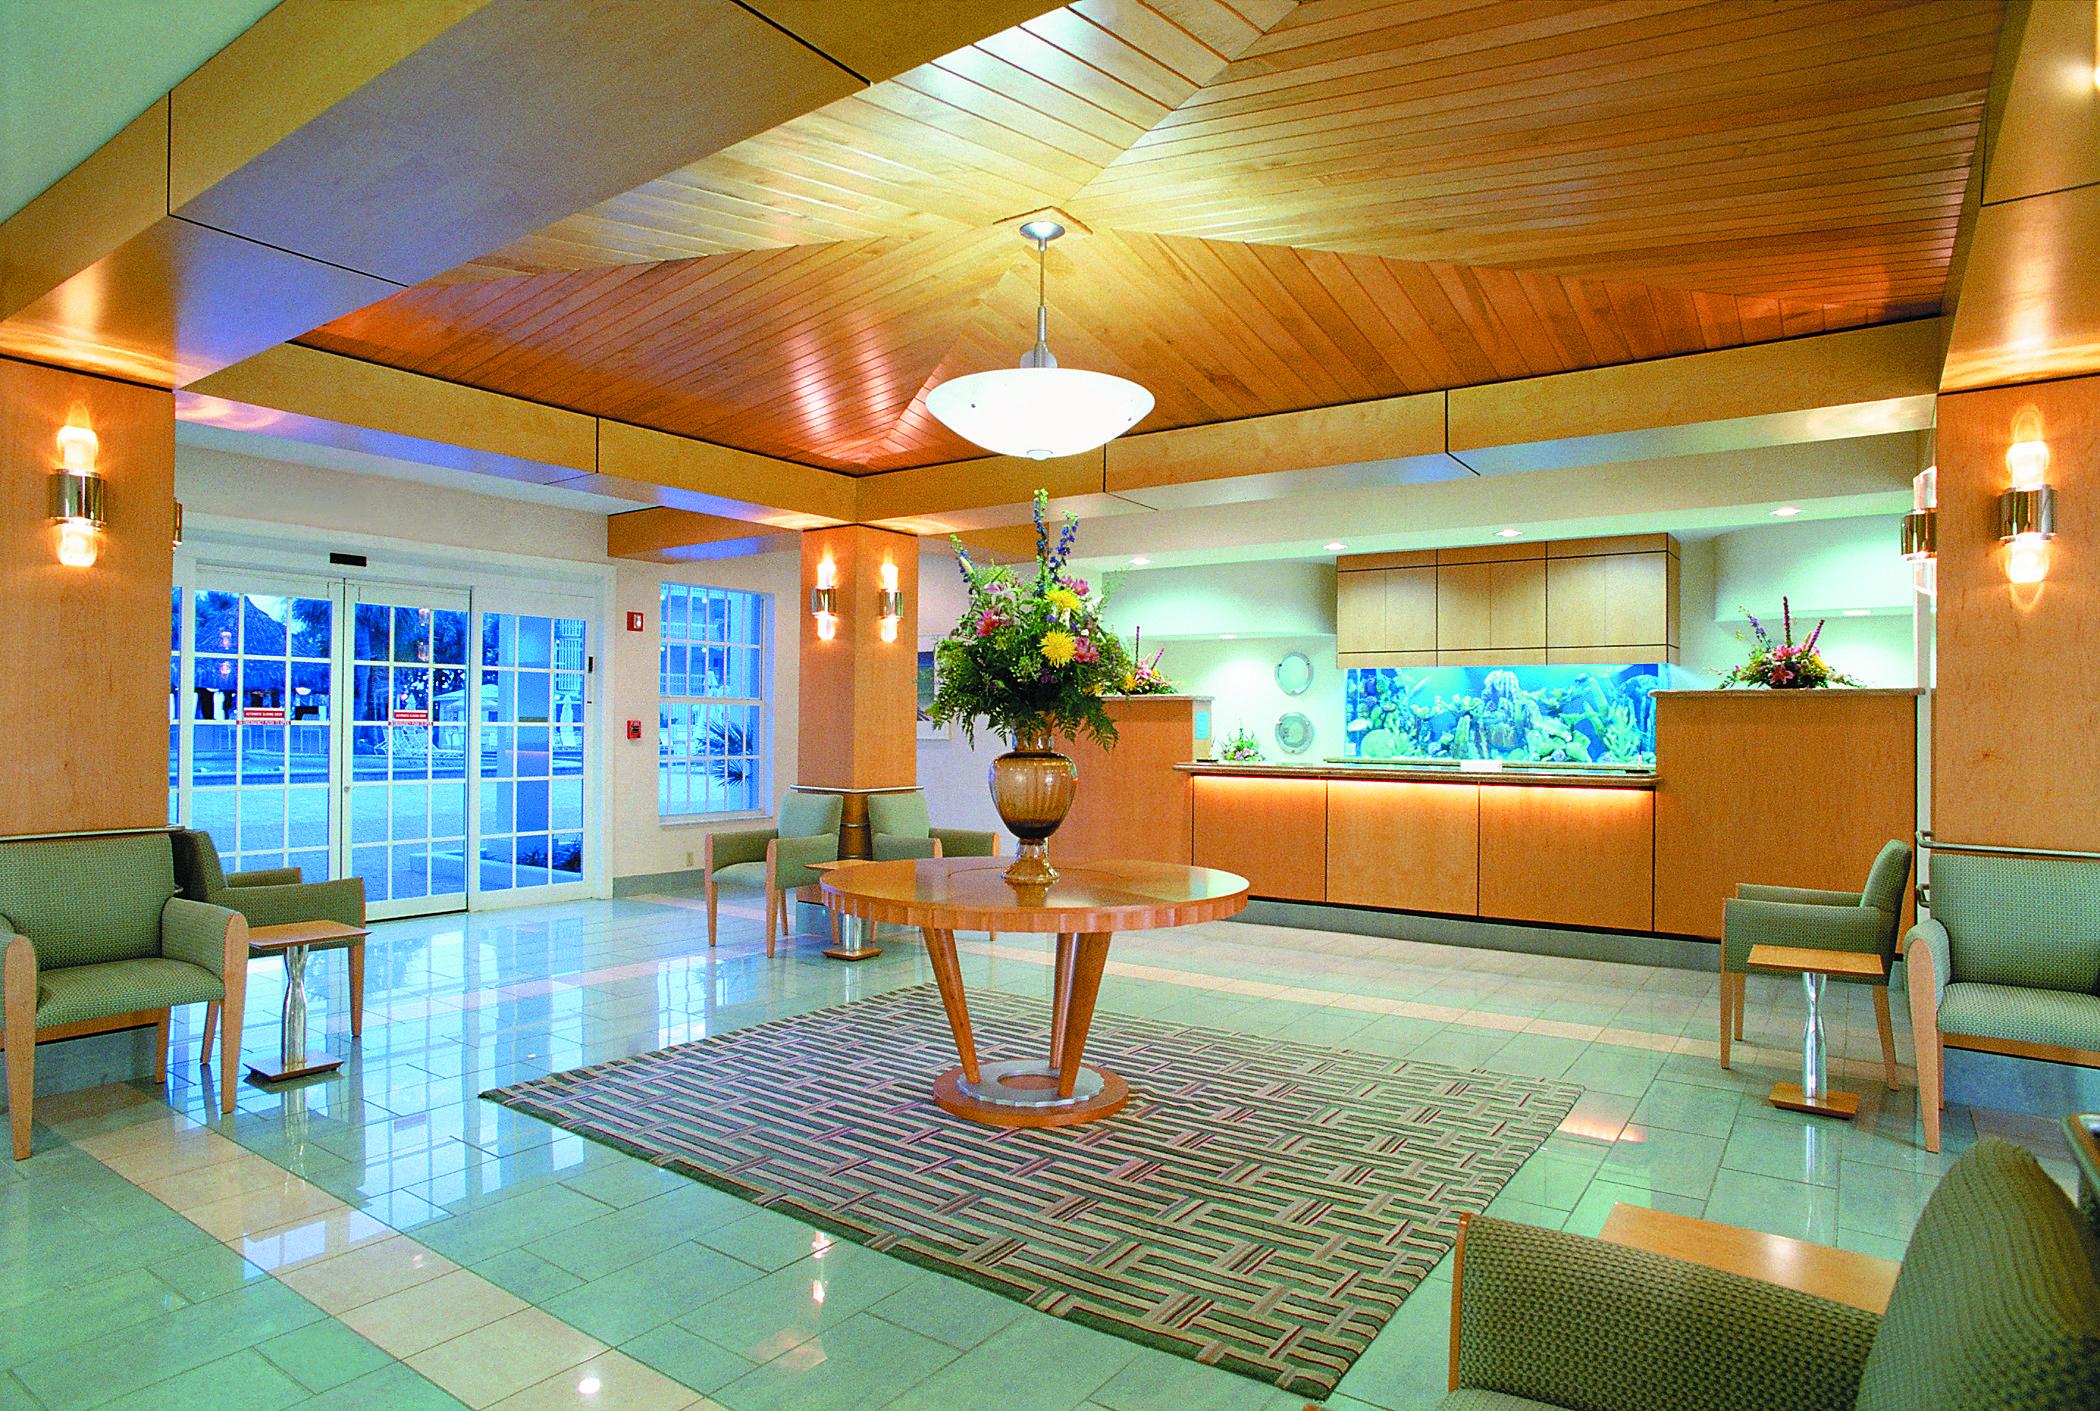 Lobby_entrance_17076_standard.jpg